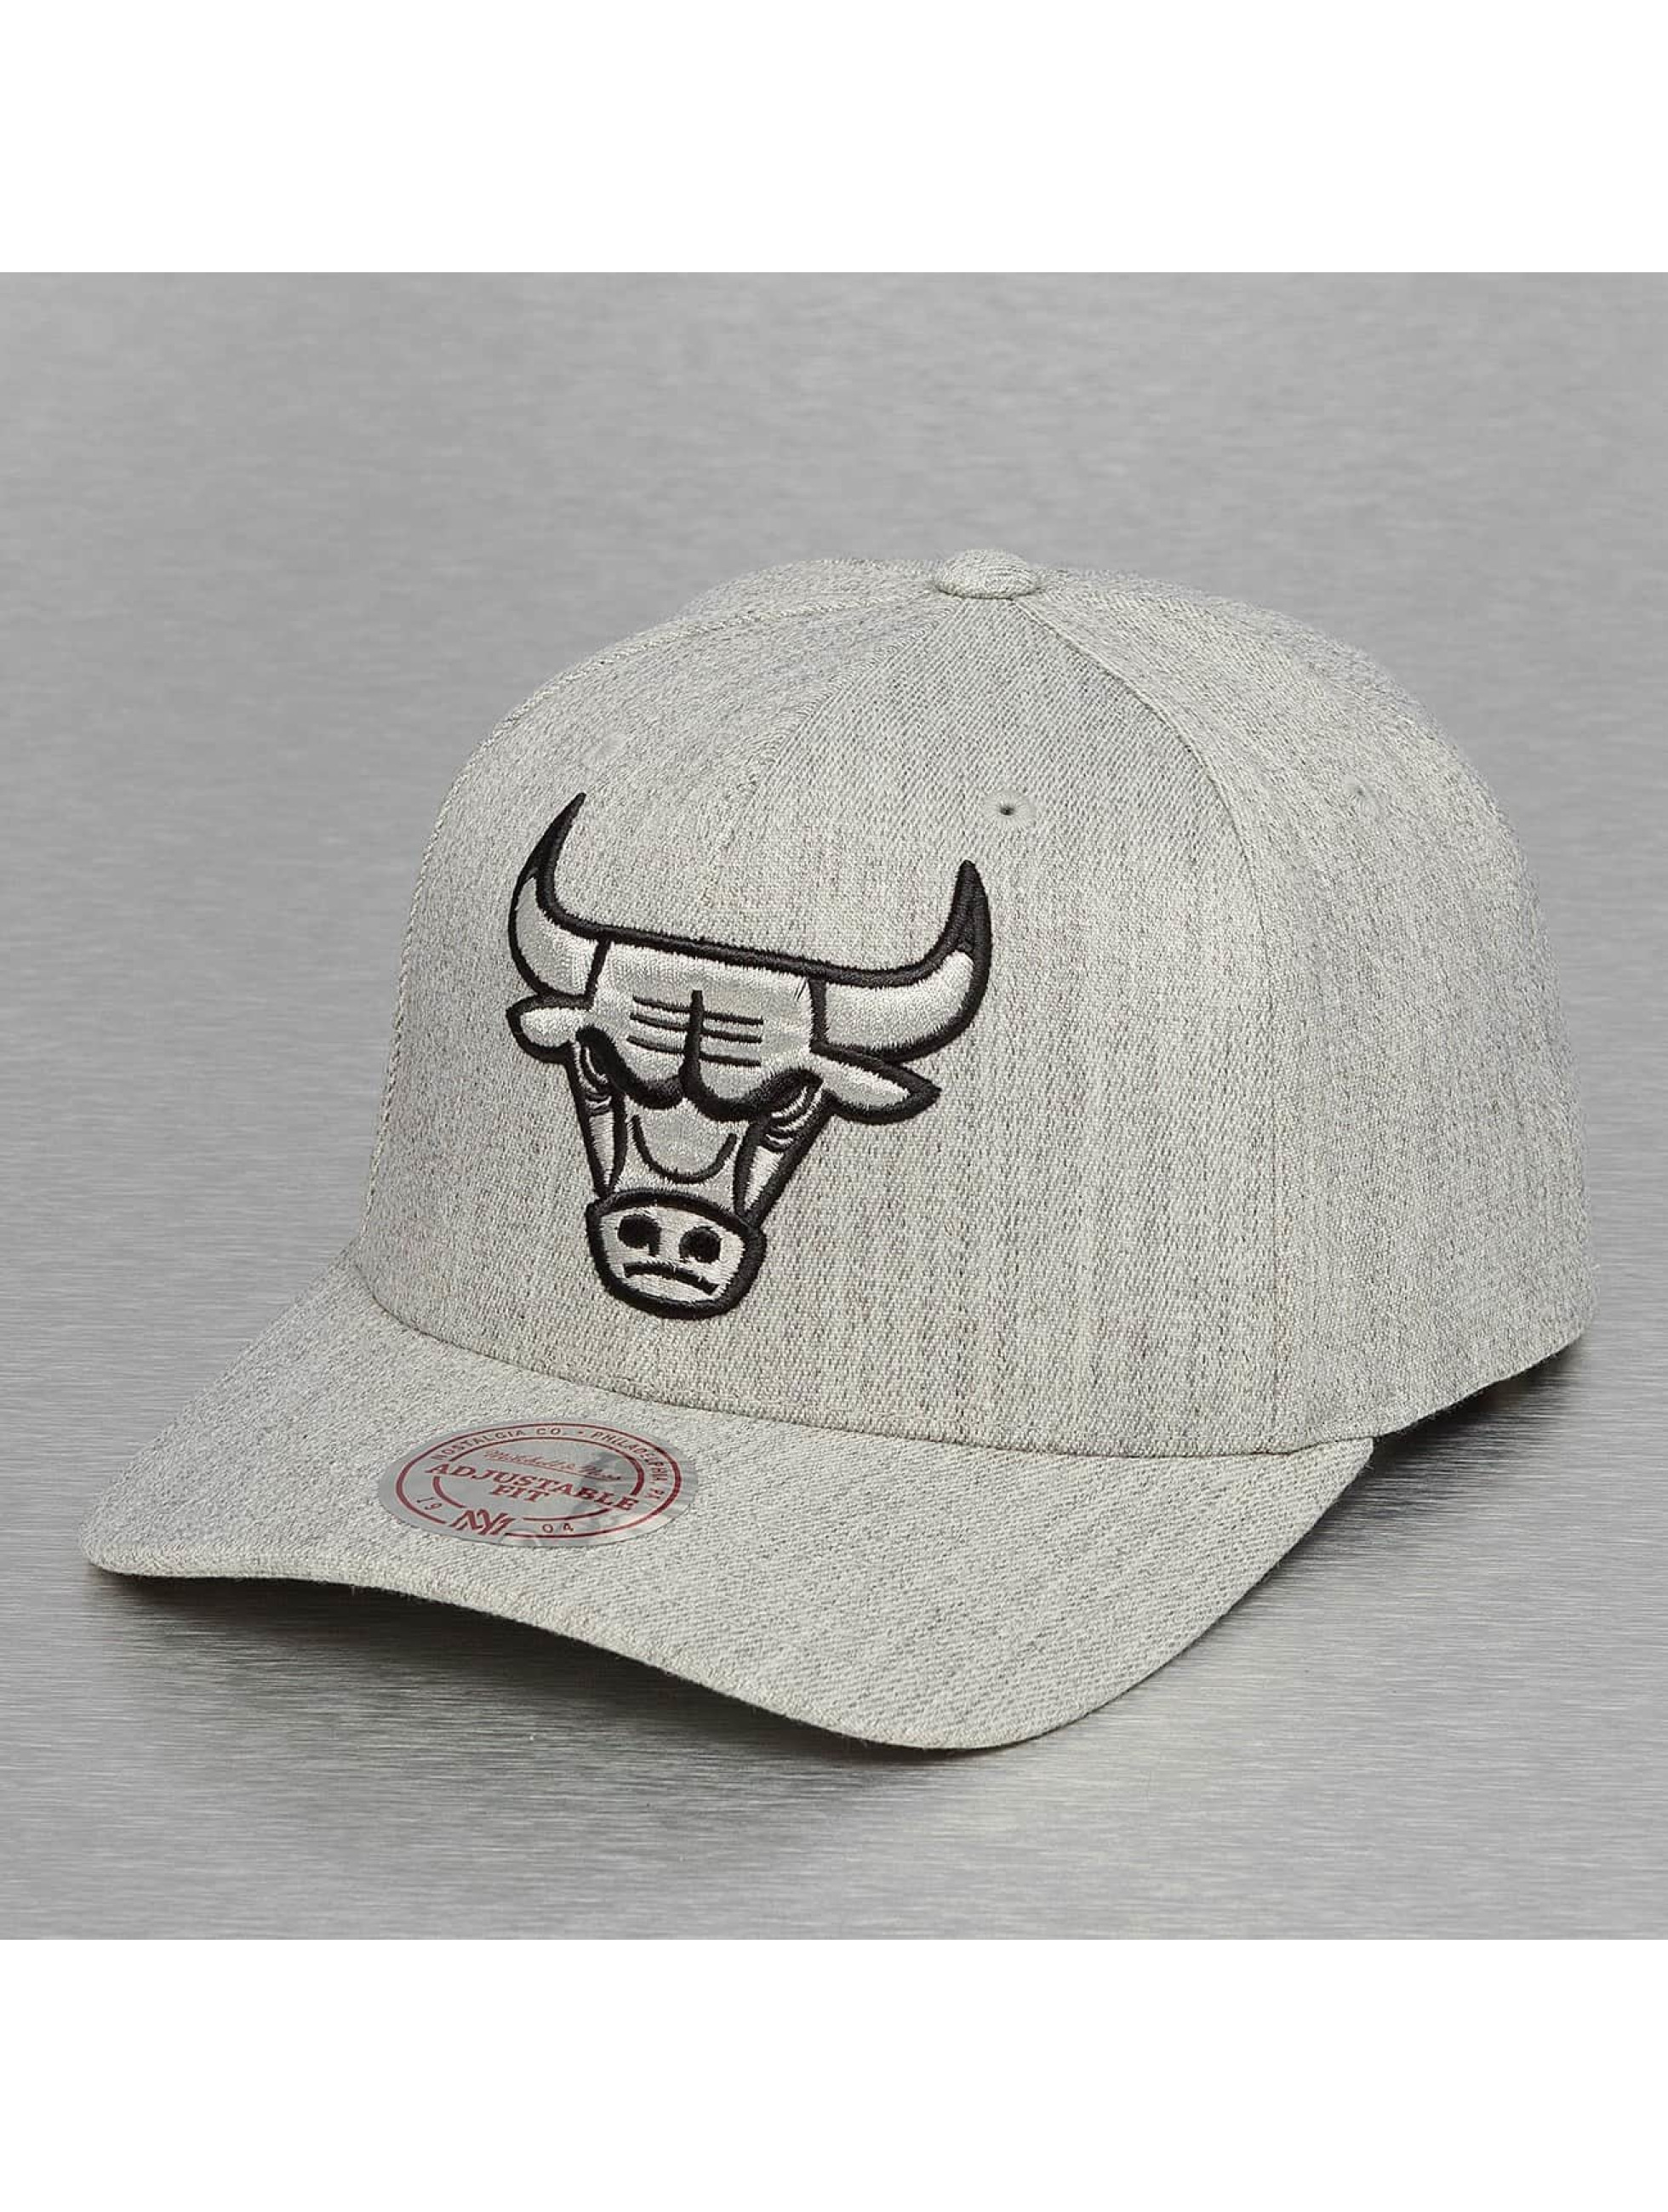 Mitchell & Ness Männer,Frauen Snapback Cap 110 Chicago Bulls in grau